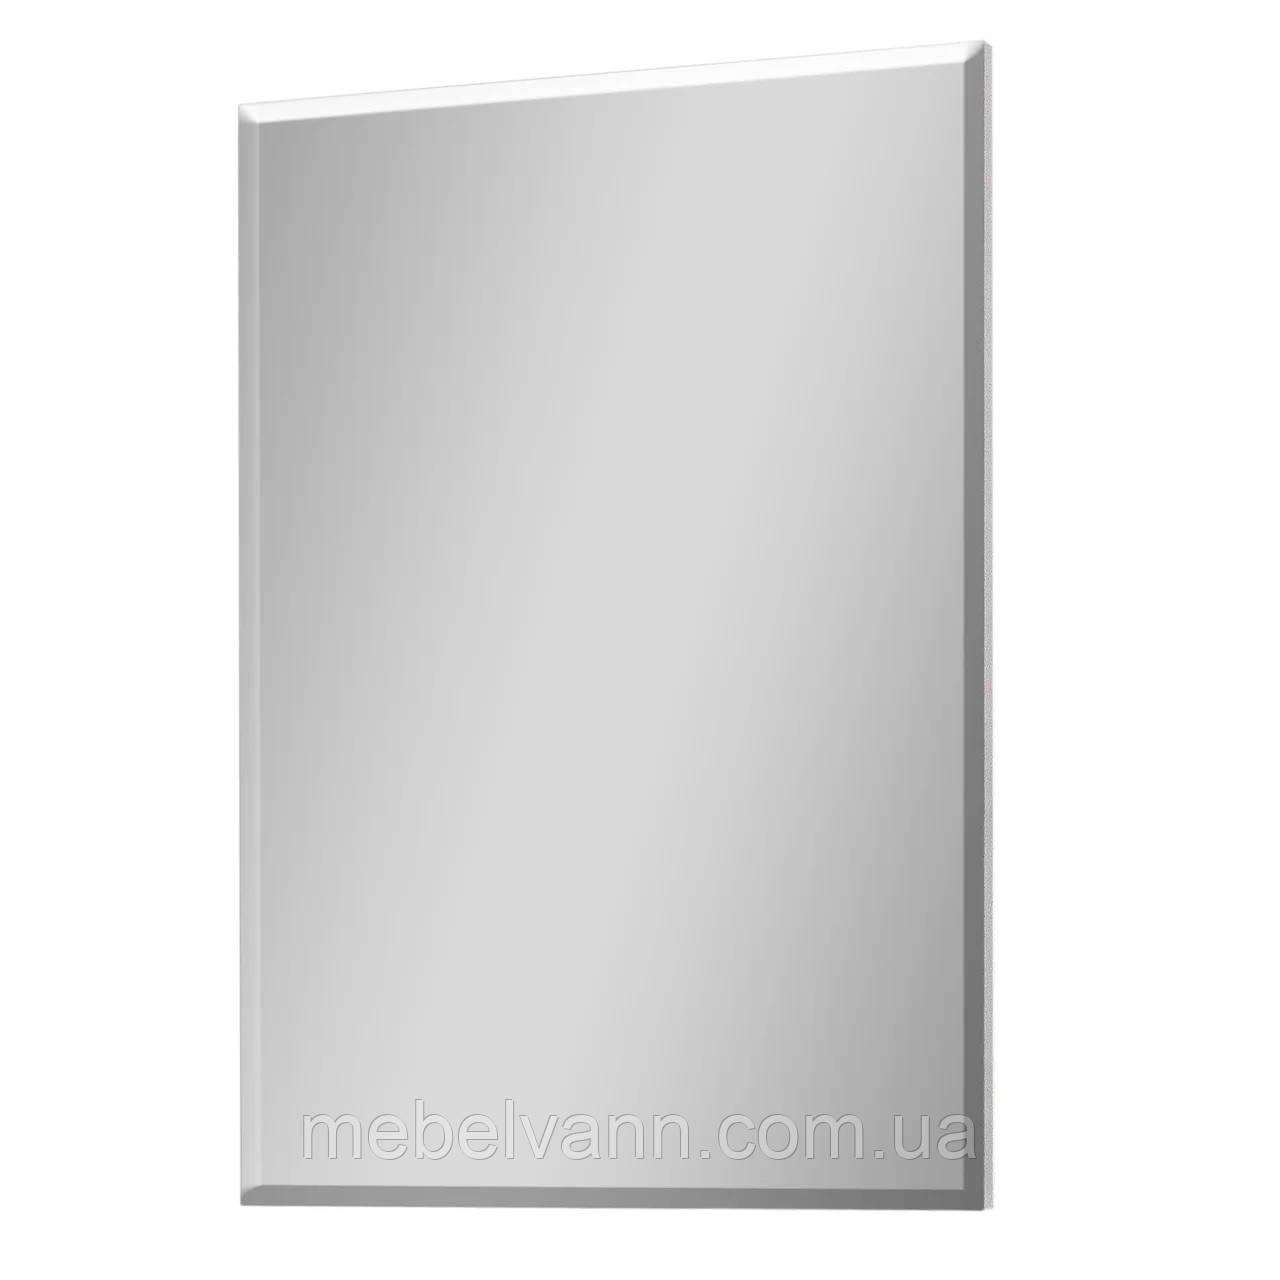 Зеркало для ванной комнаты Эко Z-50 (без подсветки)